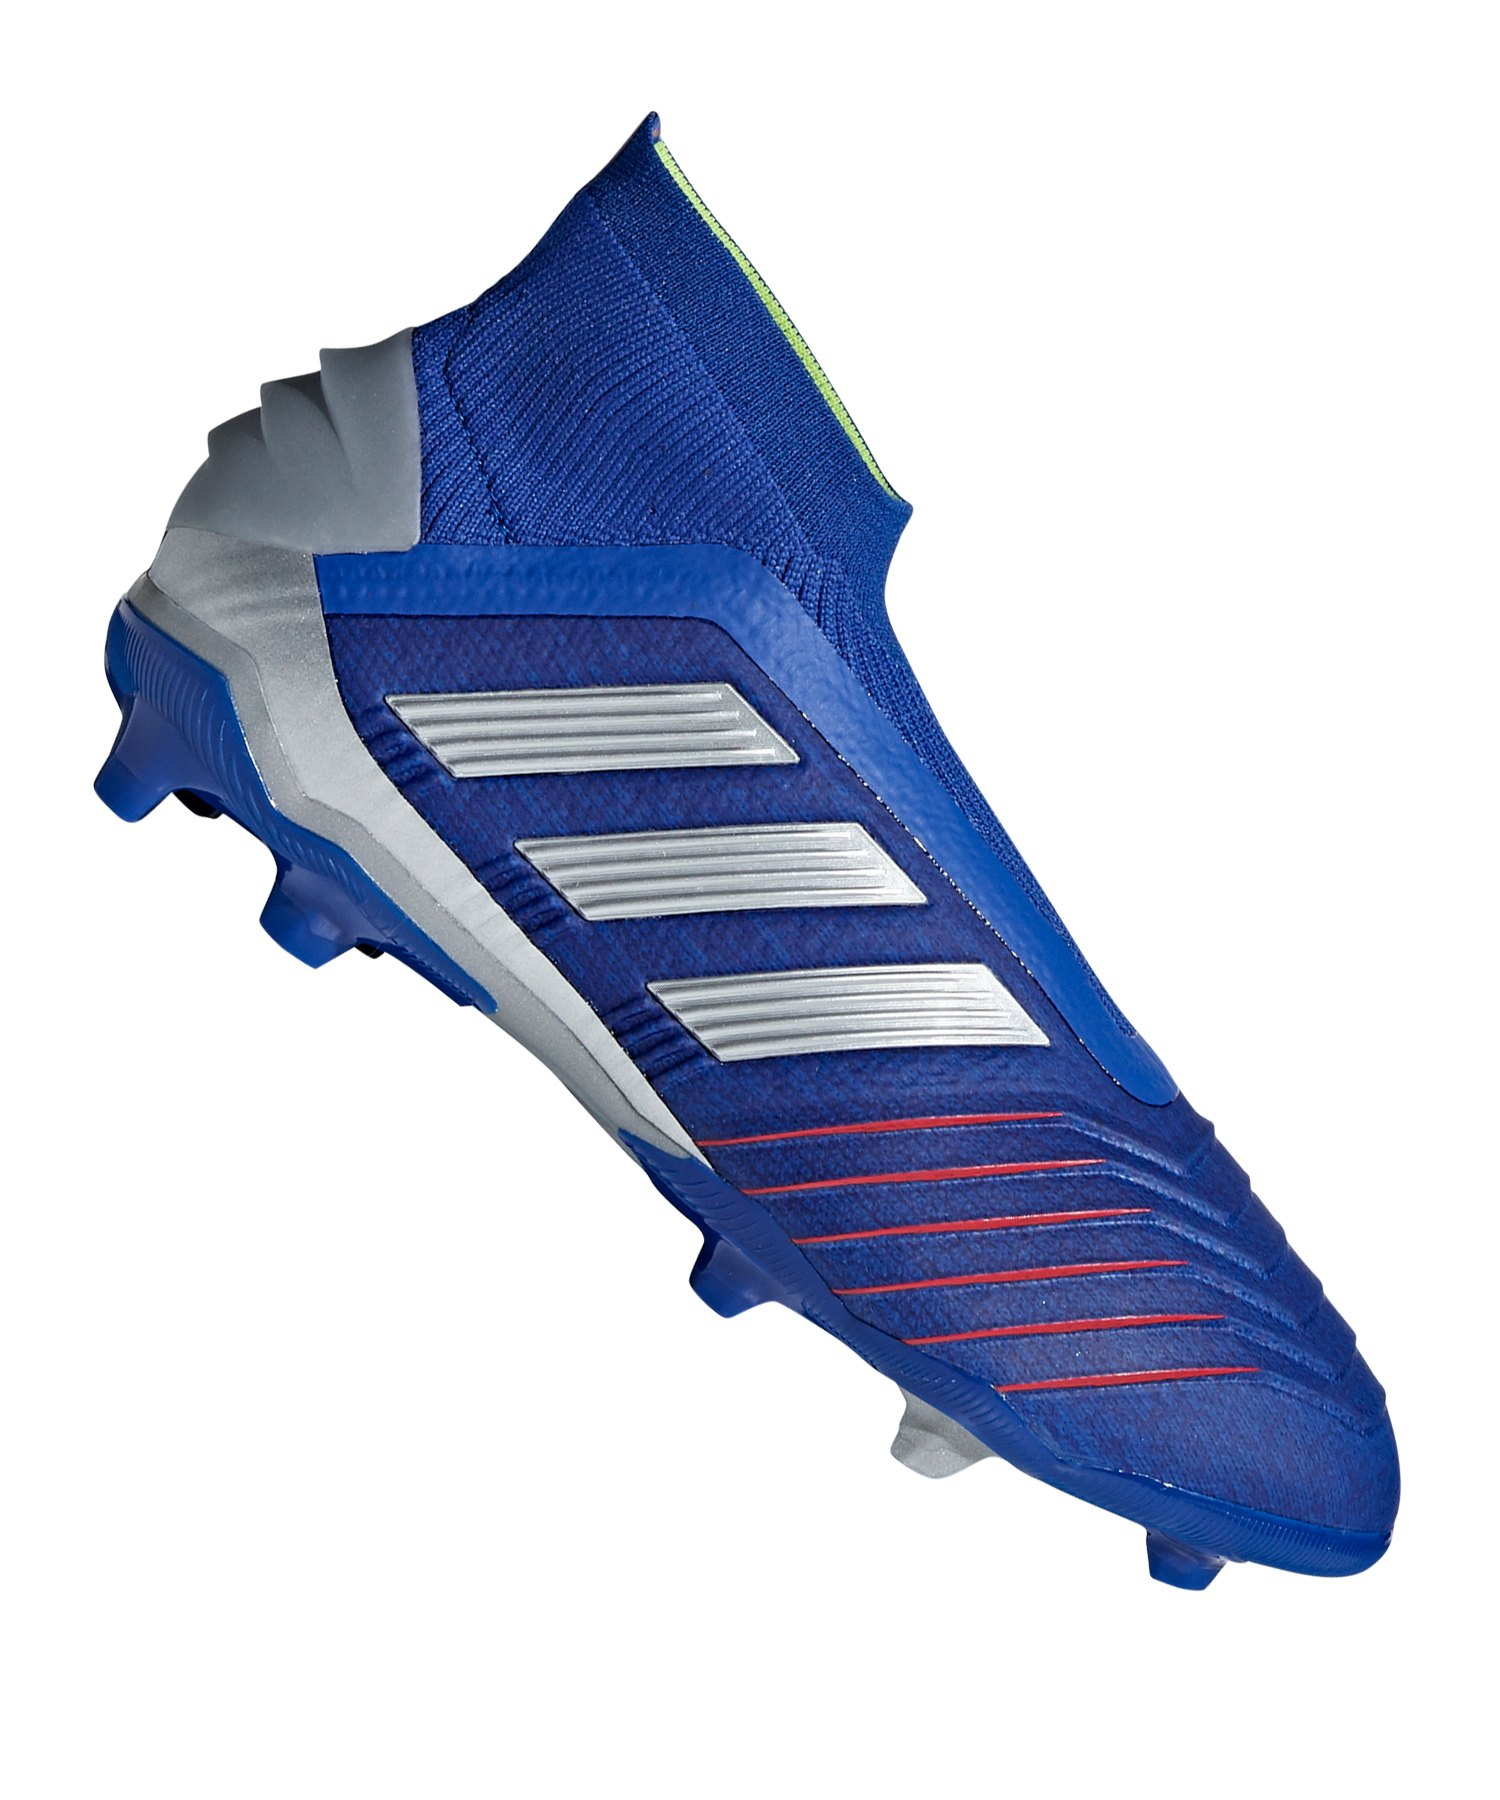 size 40 3f46d 2b2c1 adidas Predator 19+ FG J Kids Blau Silber - blau